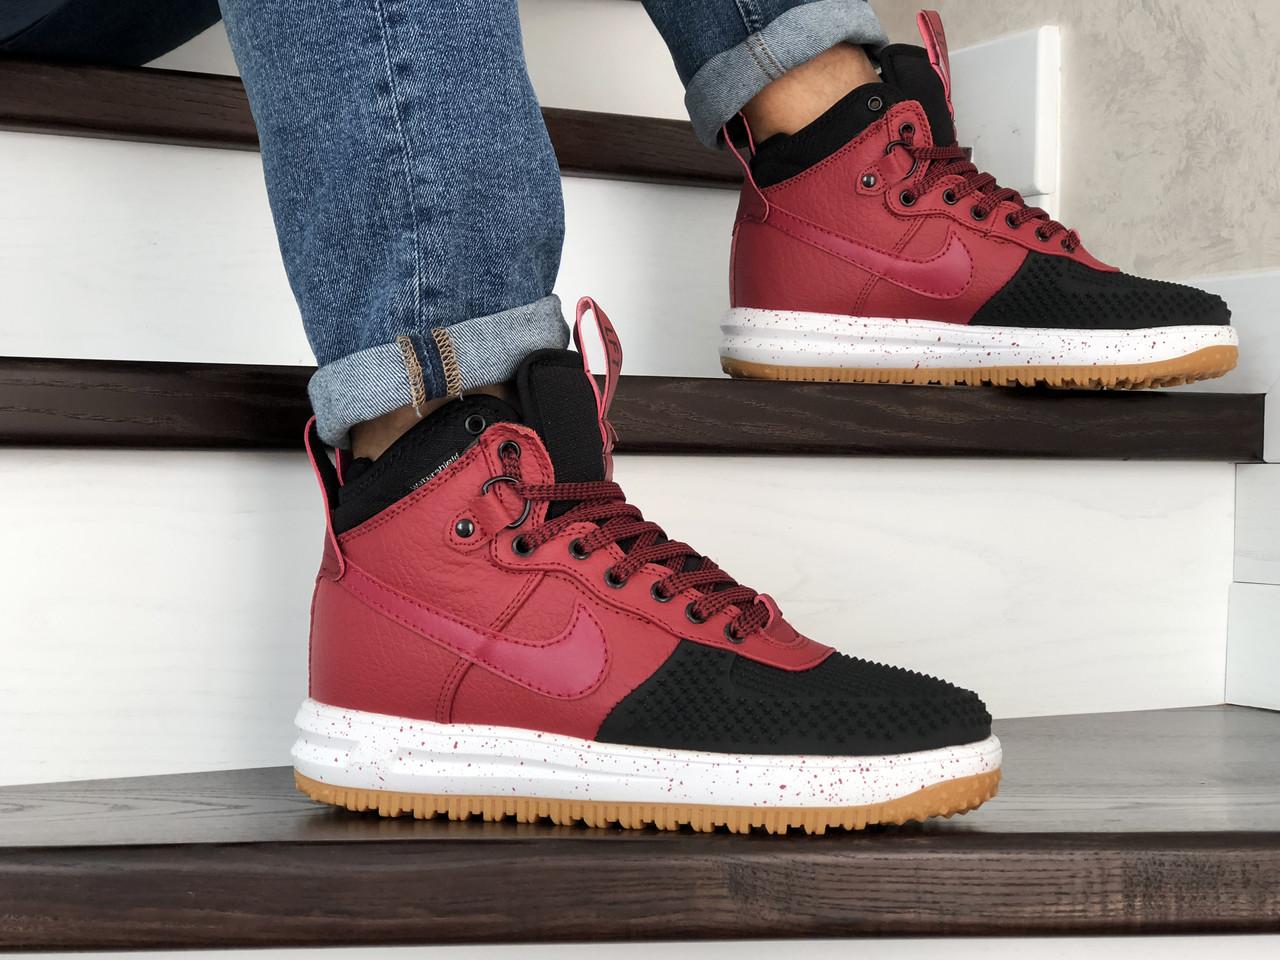 Высокие мужские кроссовки Nike Lunar Force 1 Duckboot / чоловічі кросівки Найк (Топ реплика ААА+)